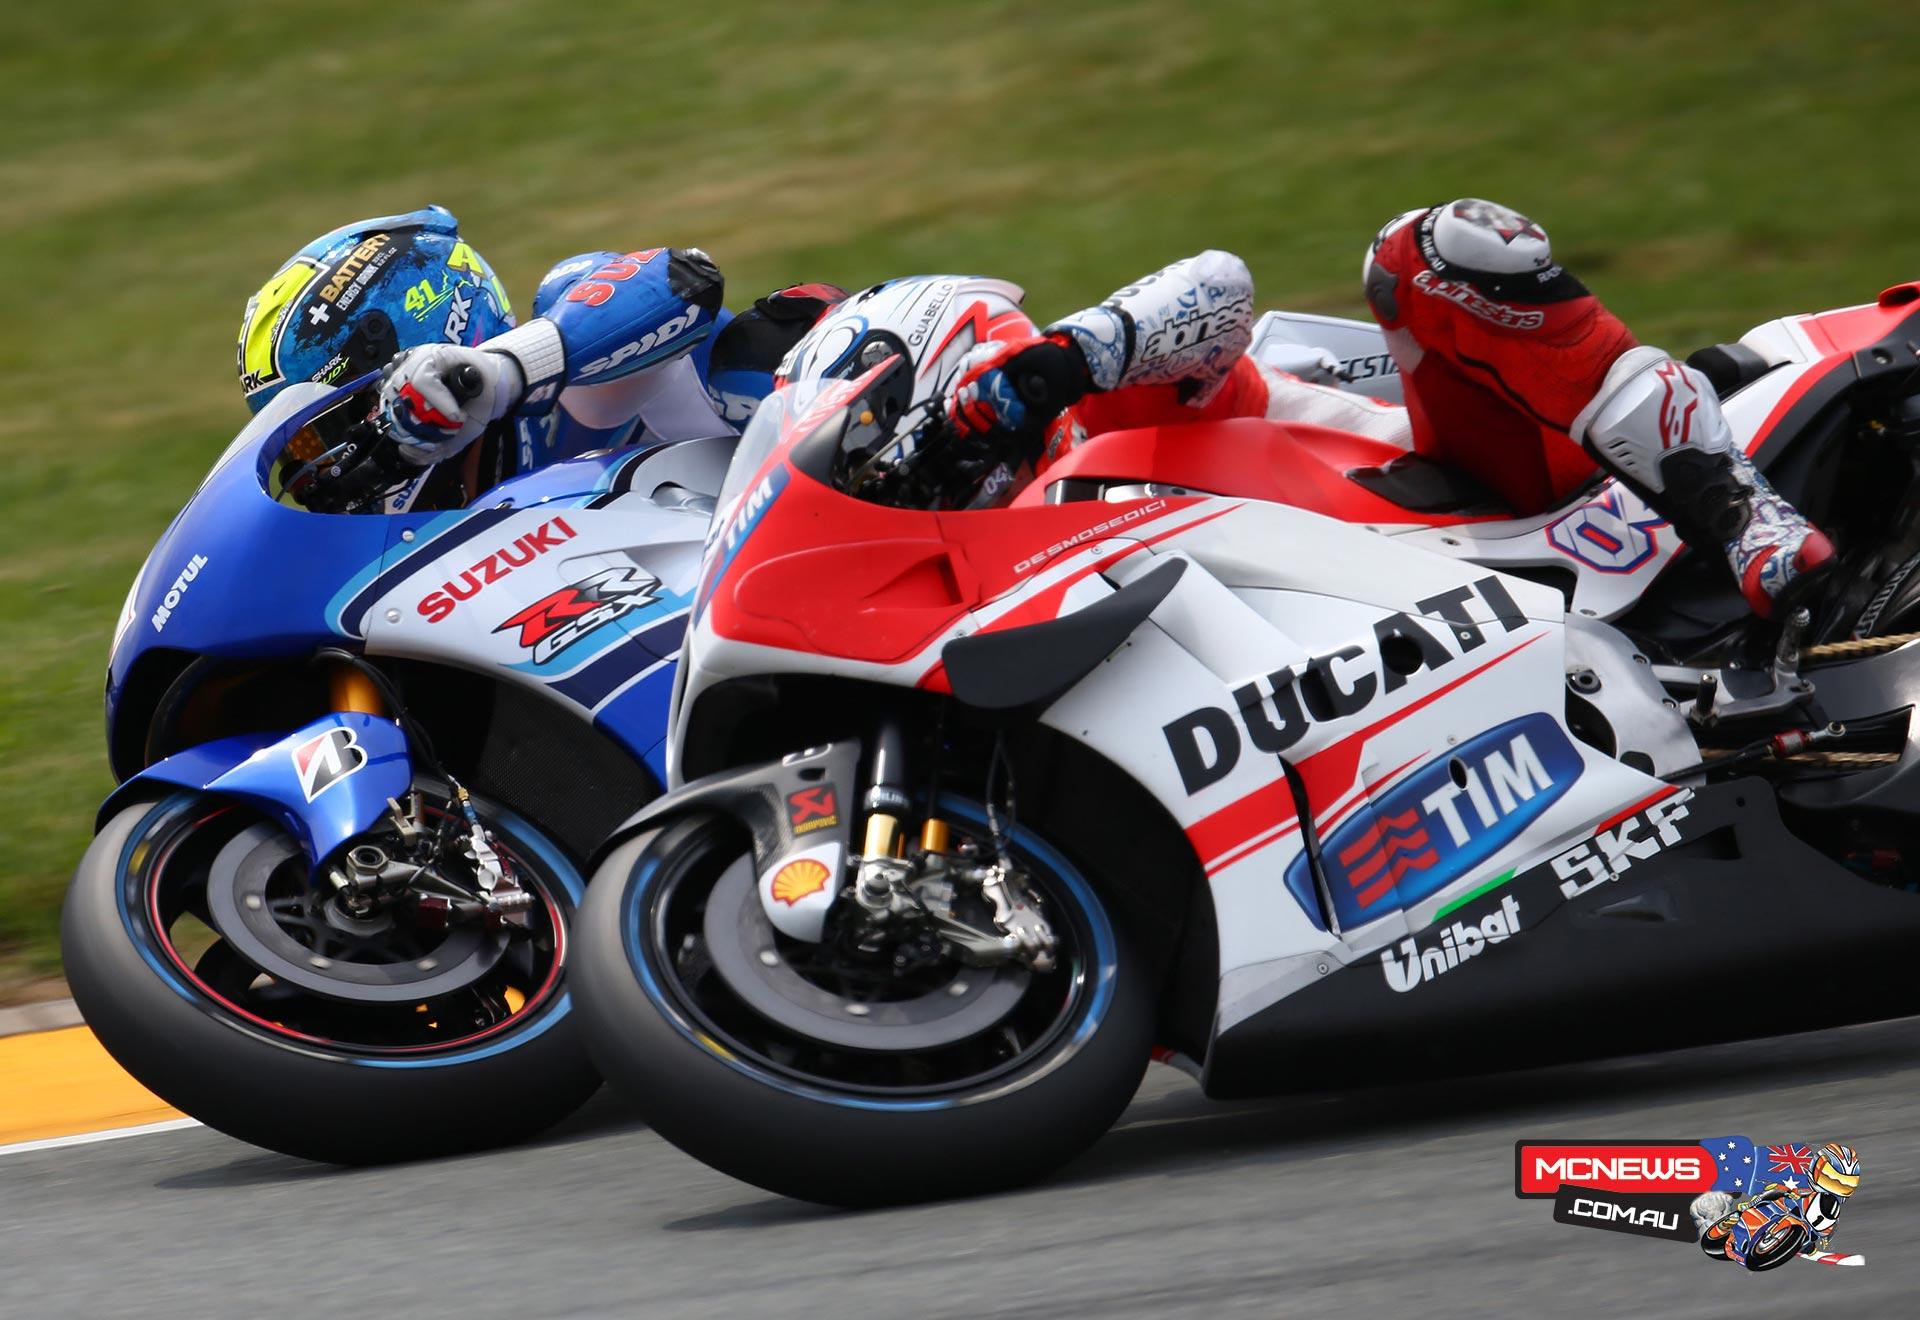 Aleix-Espargaro-MotoGP-German-GP-German-MotoGP-Sachsenring-Images-Pictures